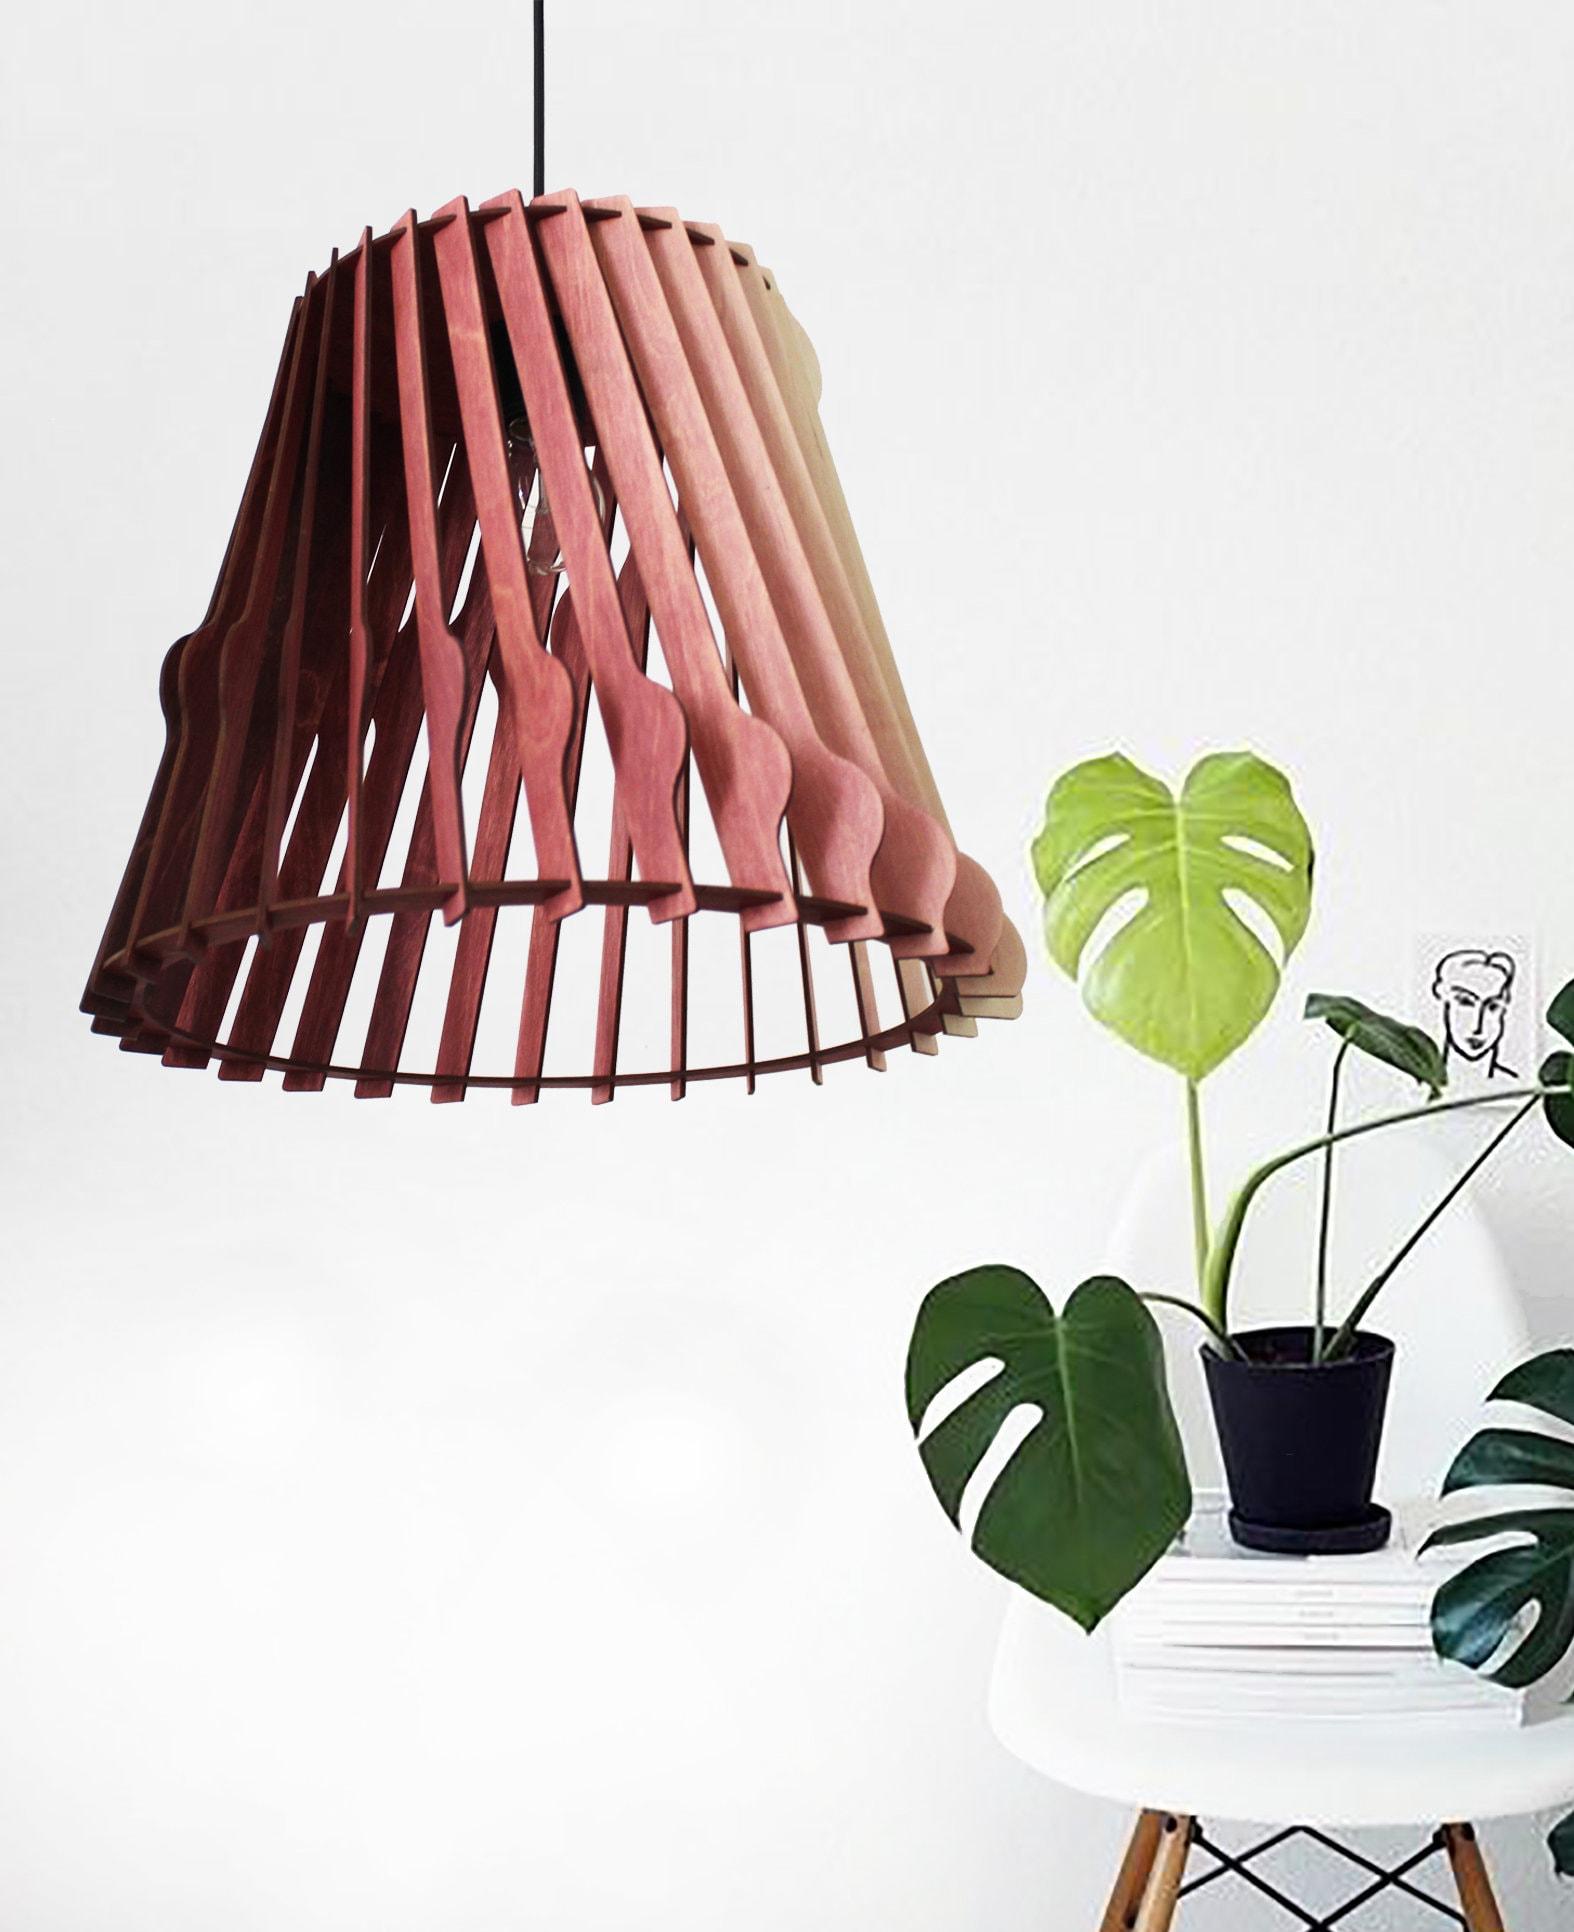 Stile scandinavo in legno lampada a sospensione lampada a